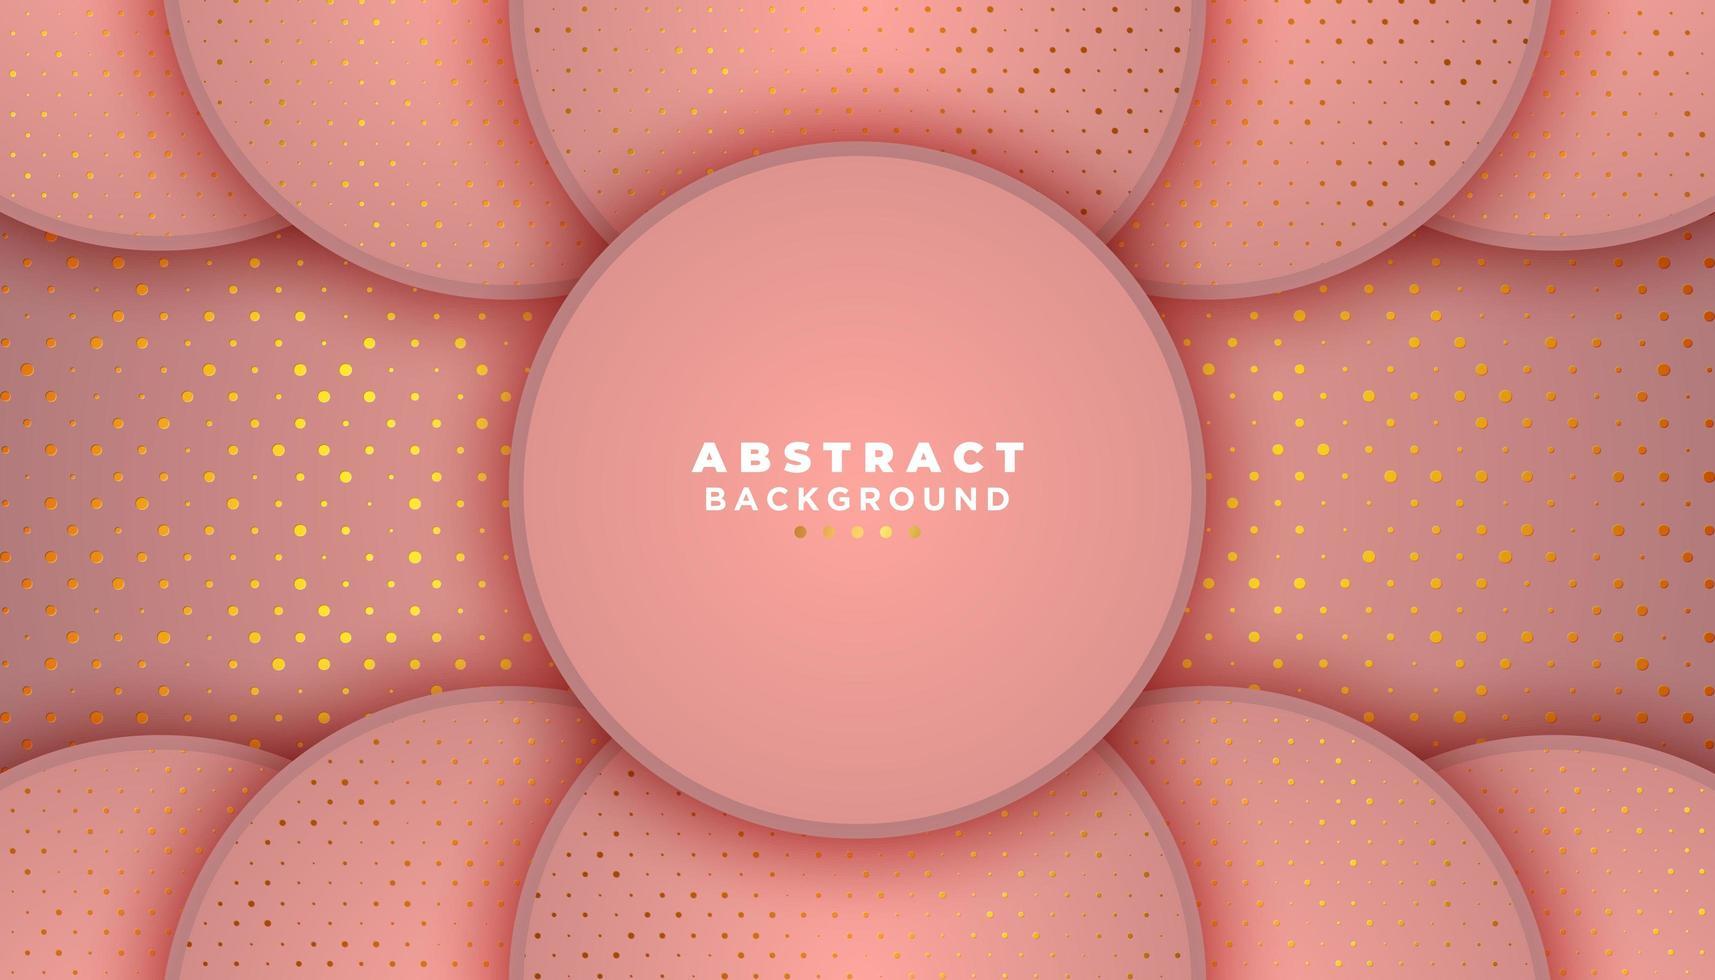 roze achtergrond met cirkels en glitter stippen vector